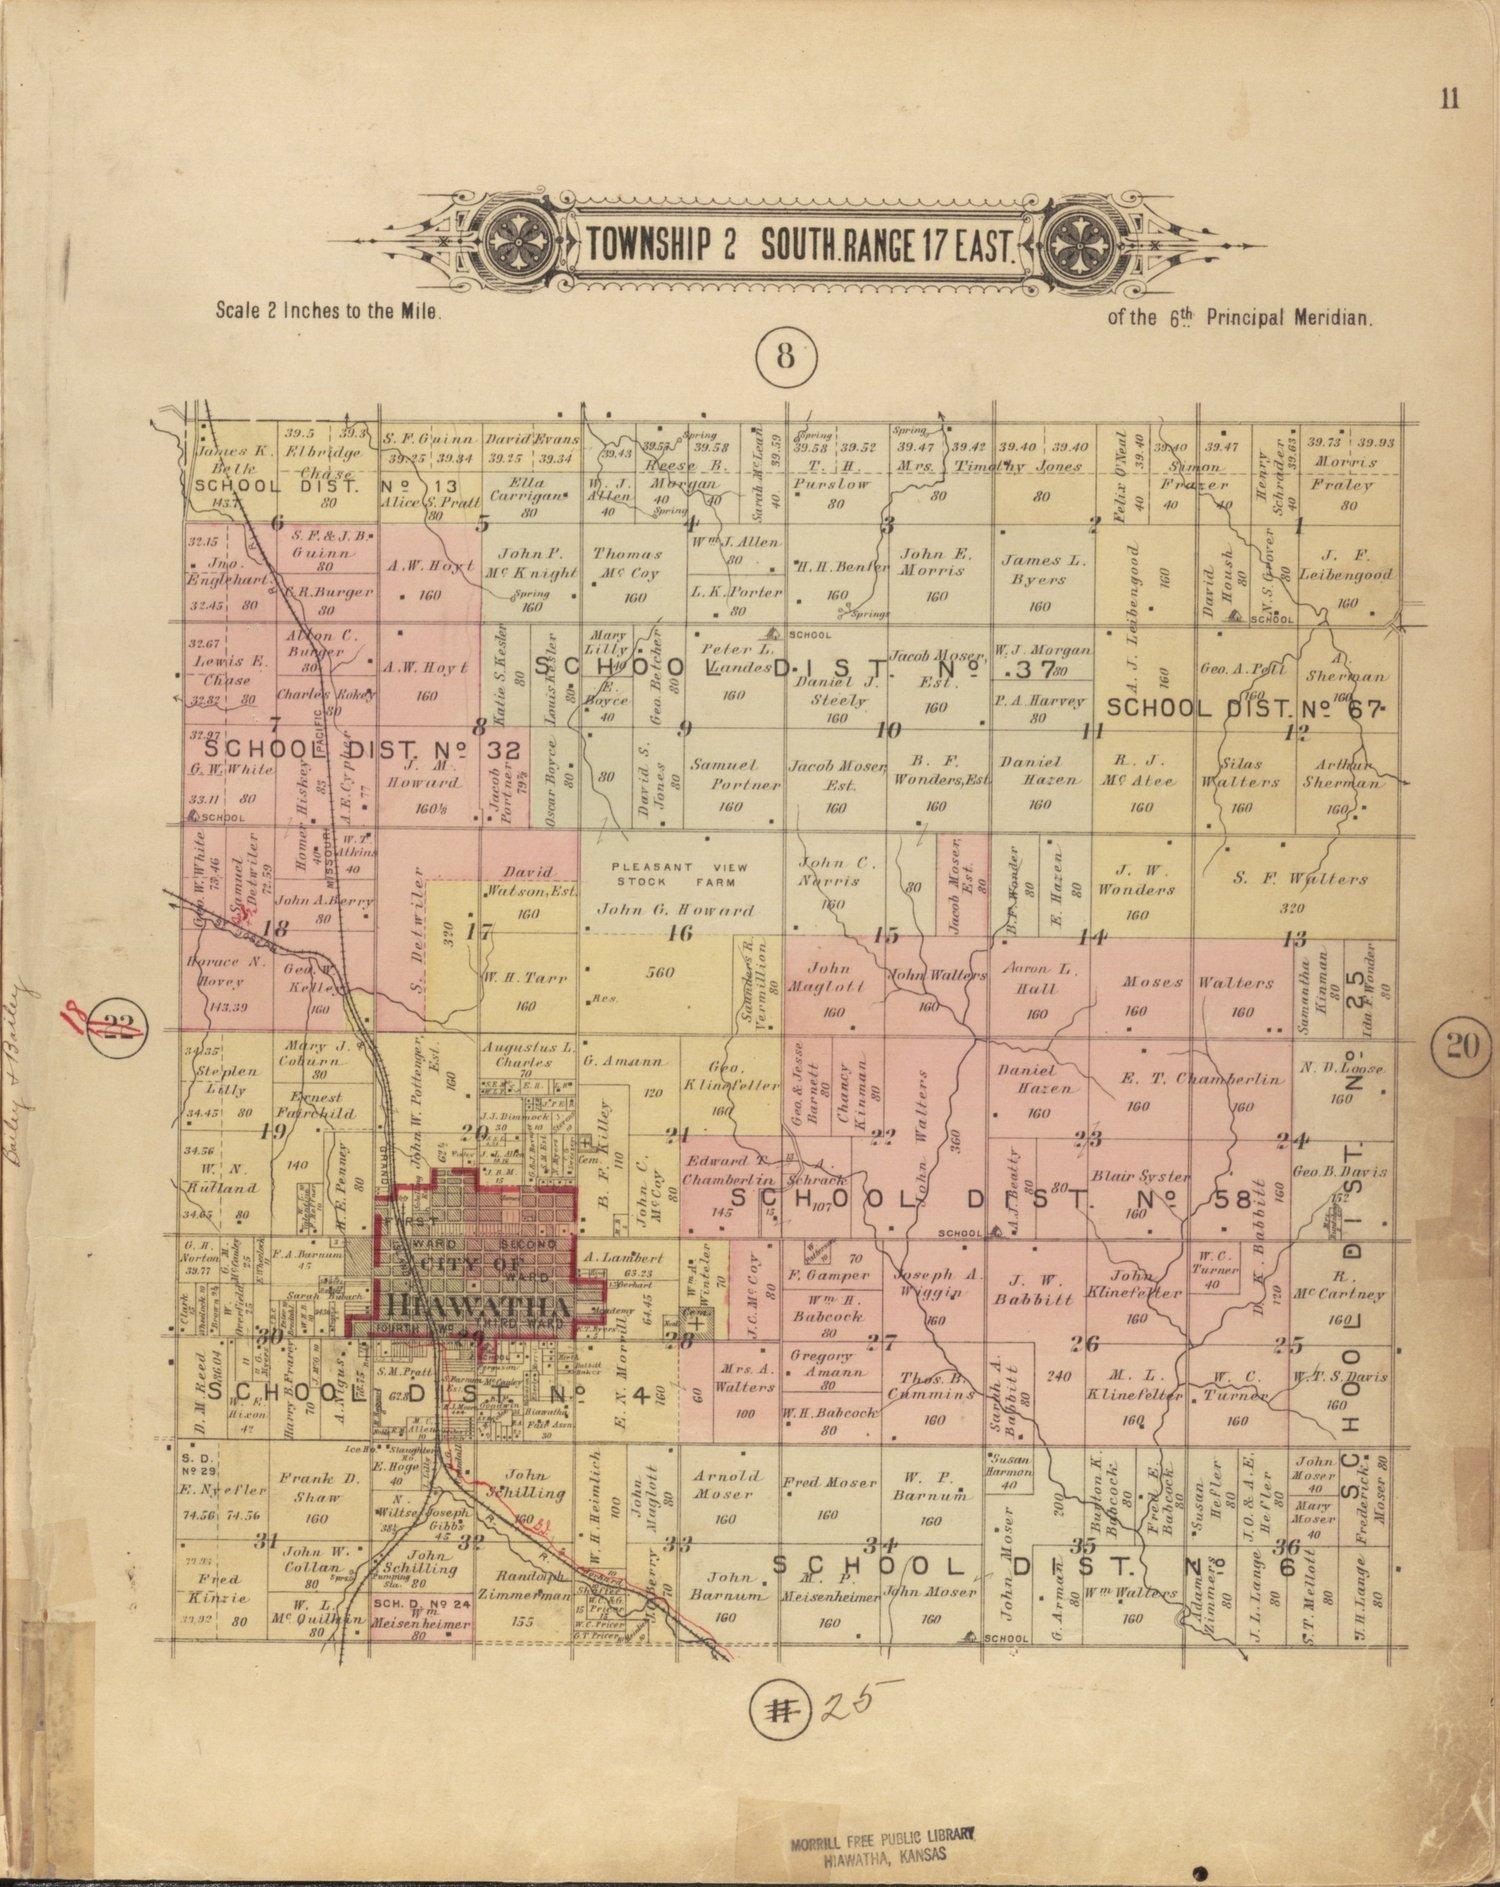 Plat book of Brown County, Kansas - 11